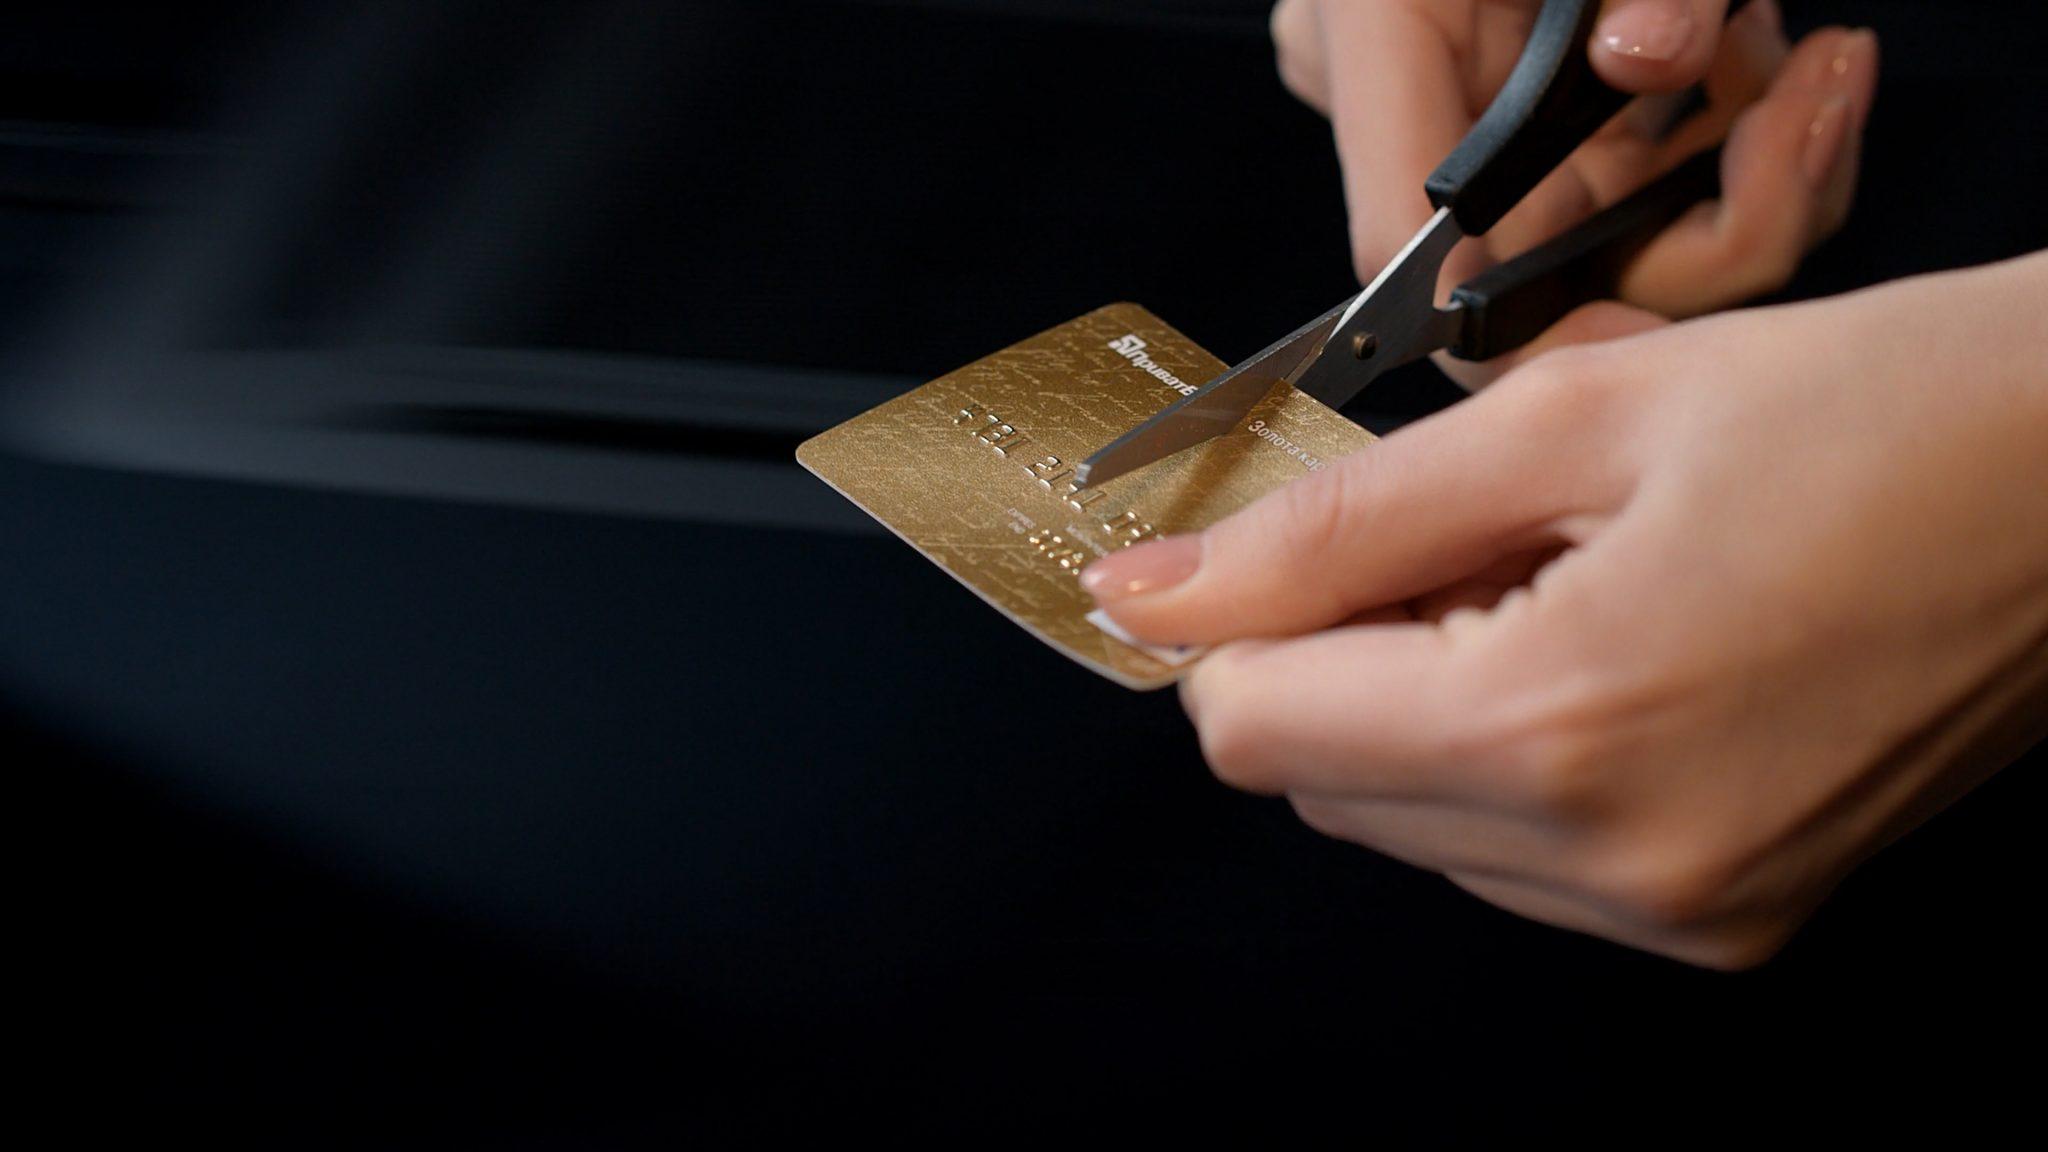 Hands cutting credit card